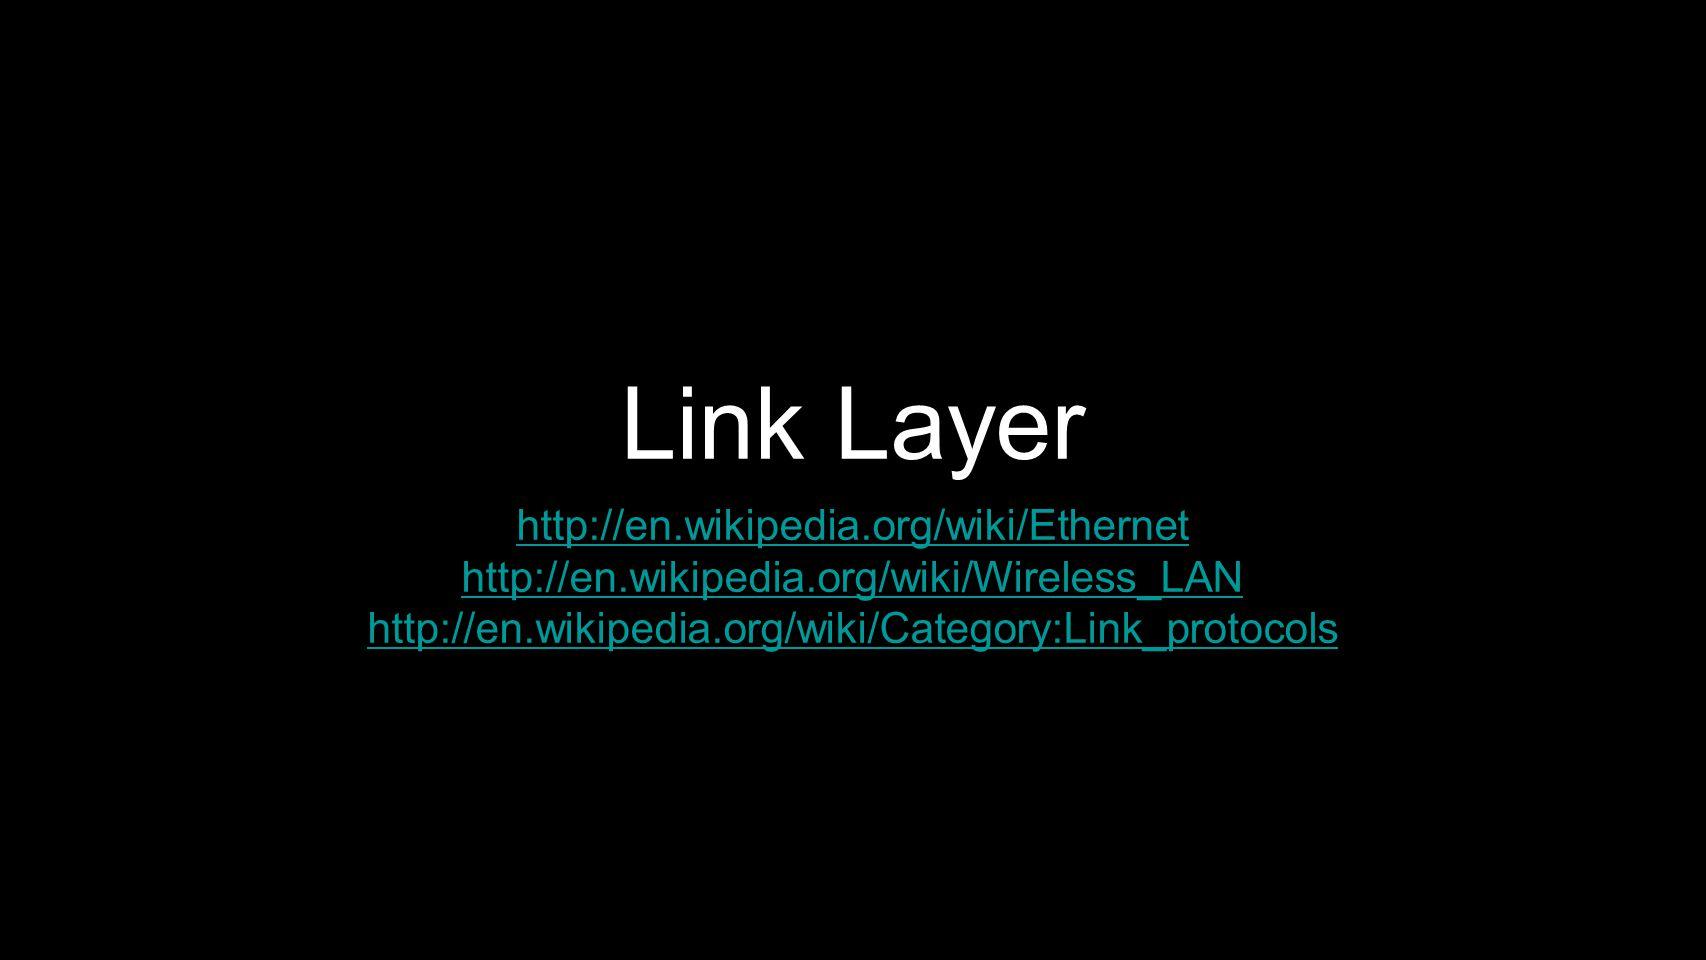 Link Layer http://en.wikipedia.org/wiki/Ethernet http://en.wikipedia.org/wiki/Wireless_LAN http://en.wikipedia.org/wiki/Category:Link_protocols